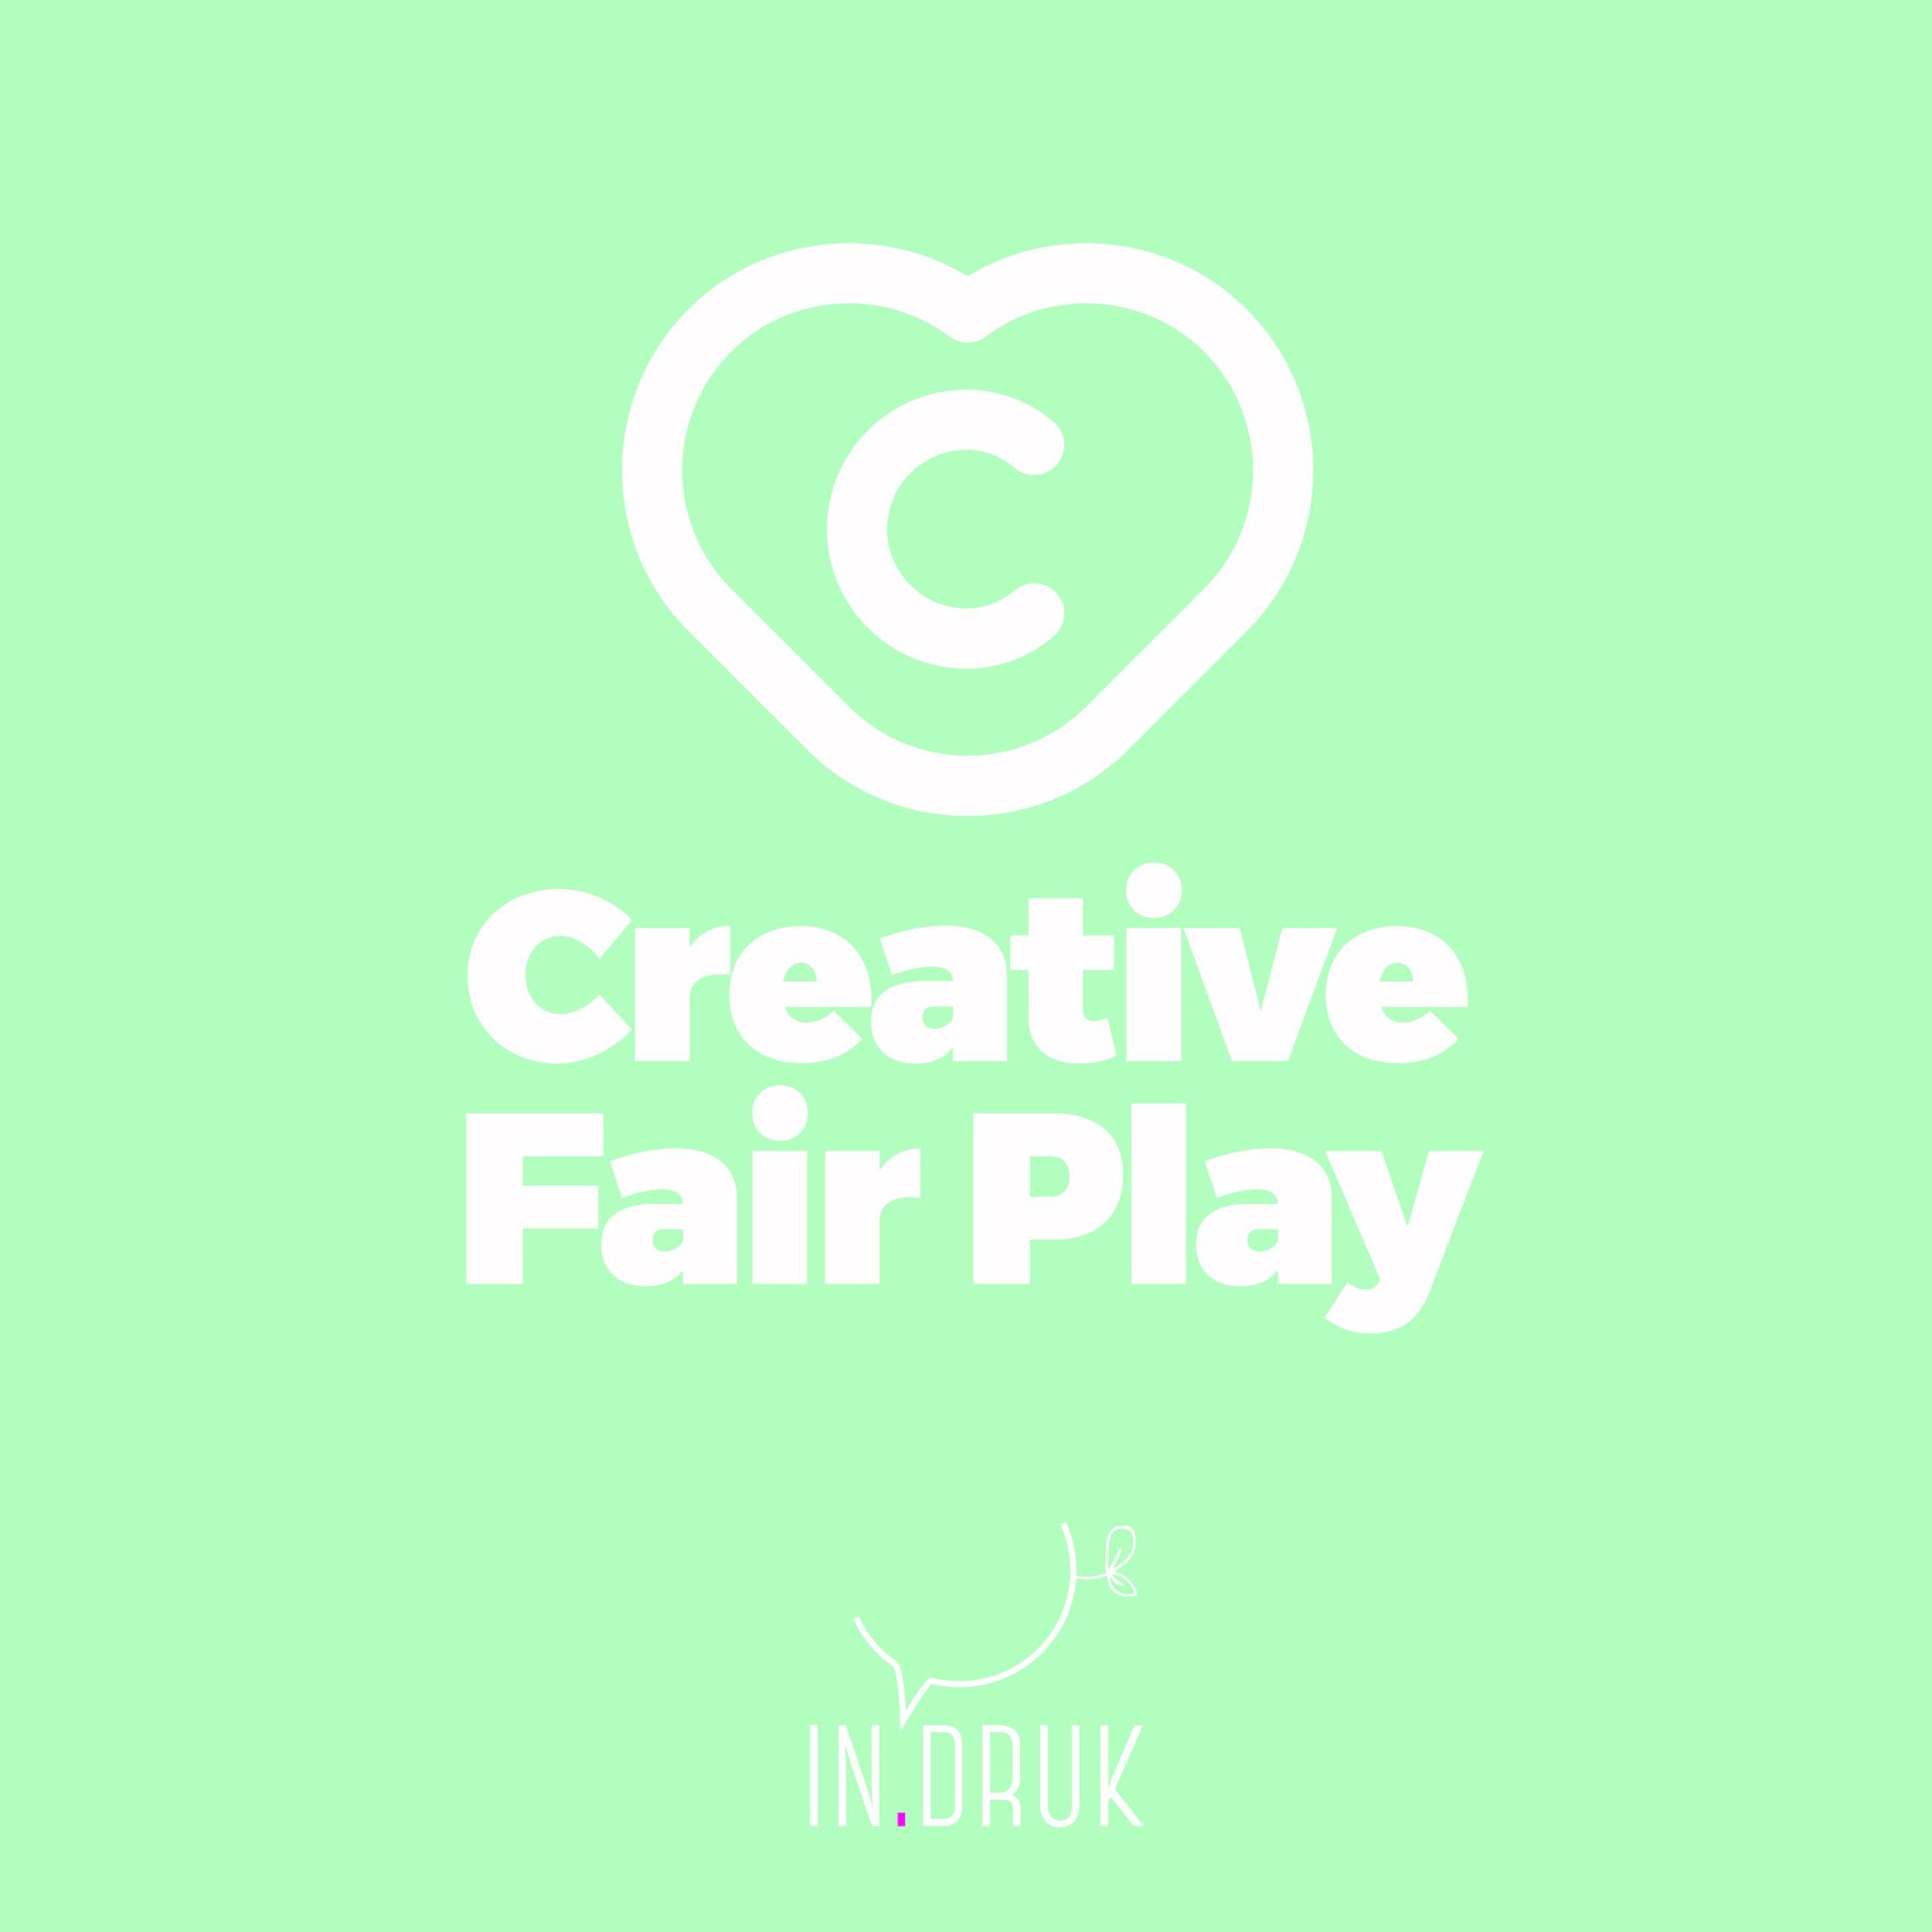 Creative Fair Play